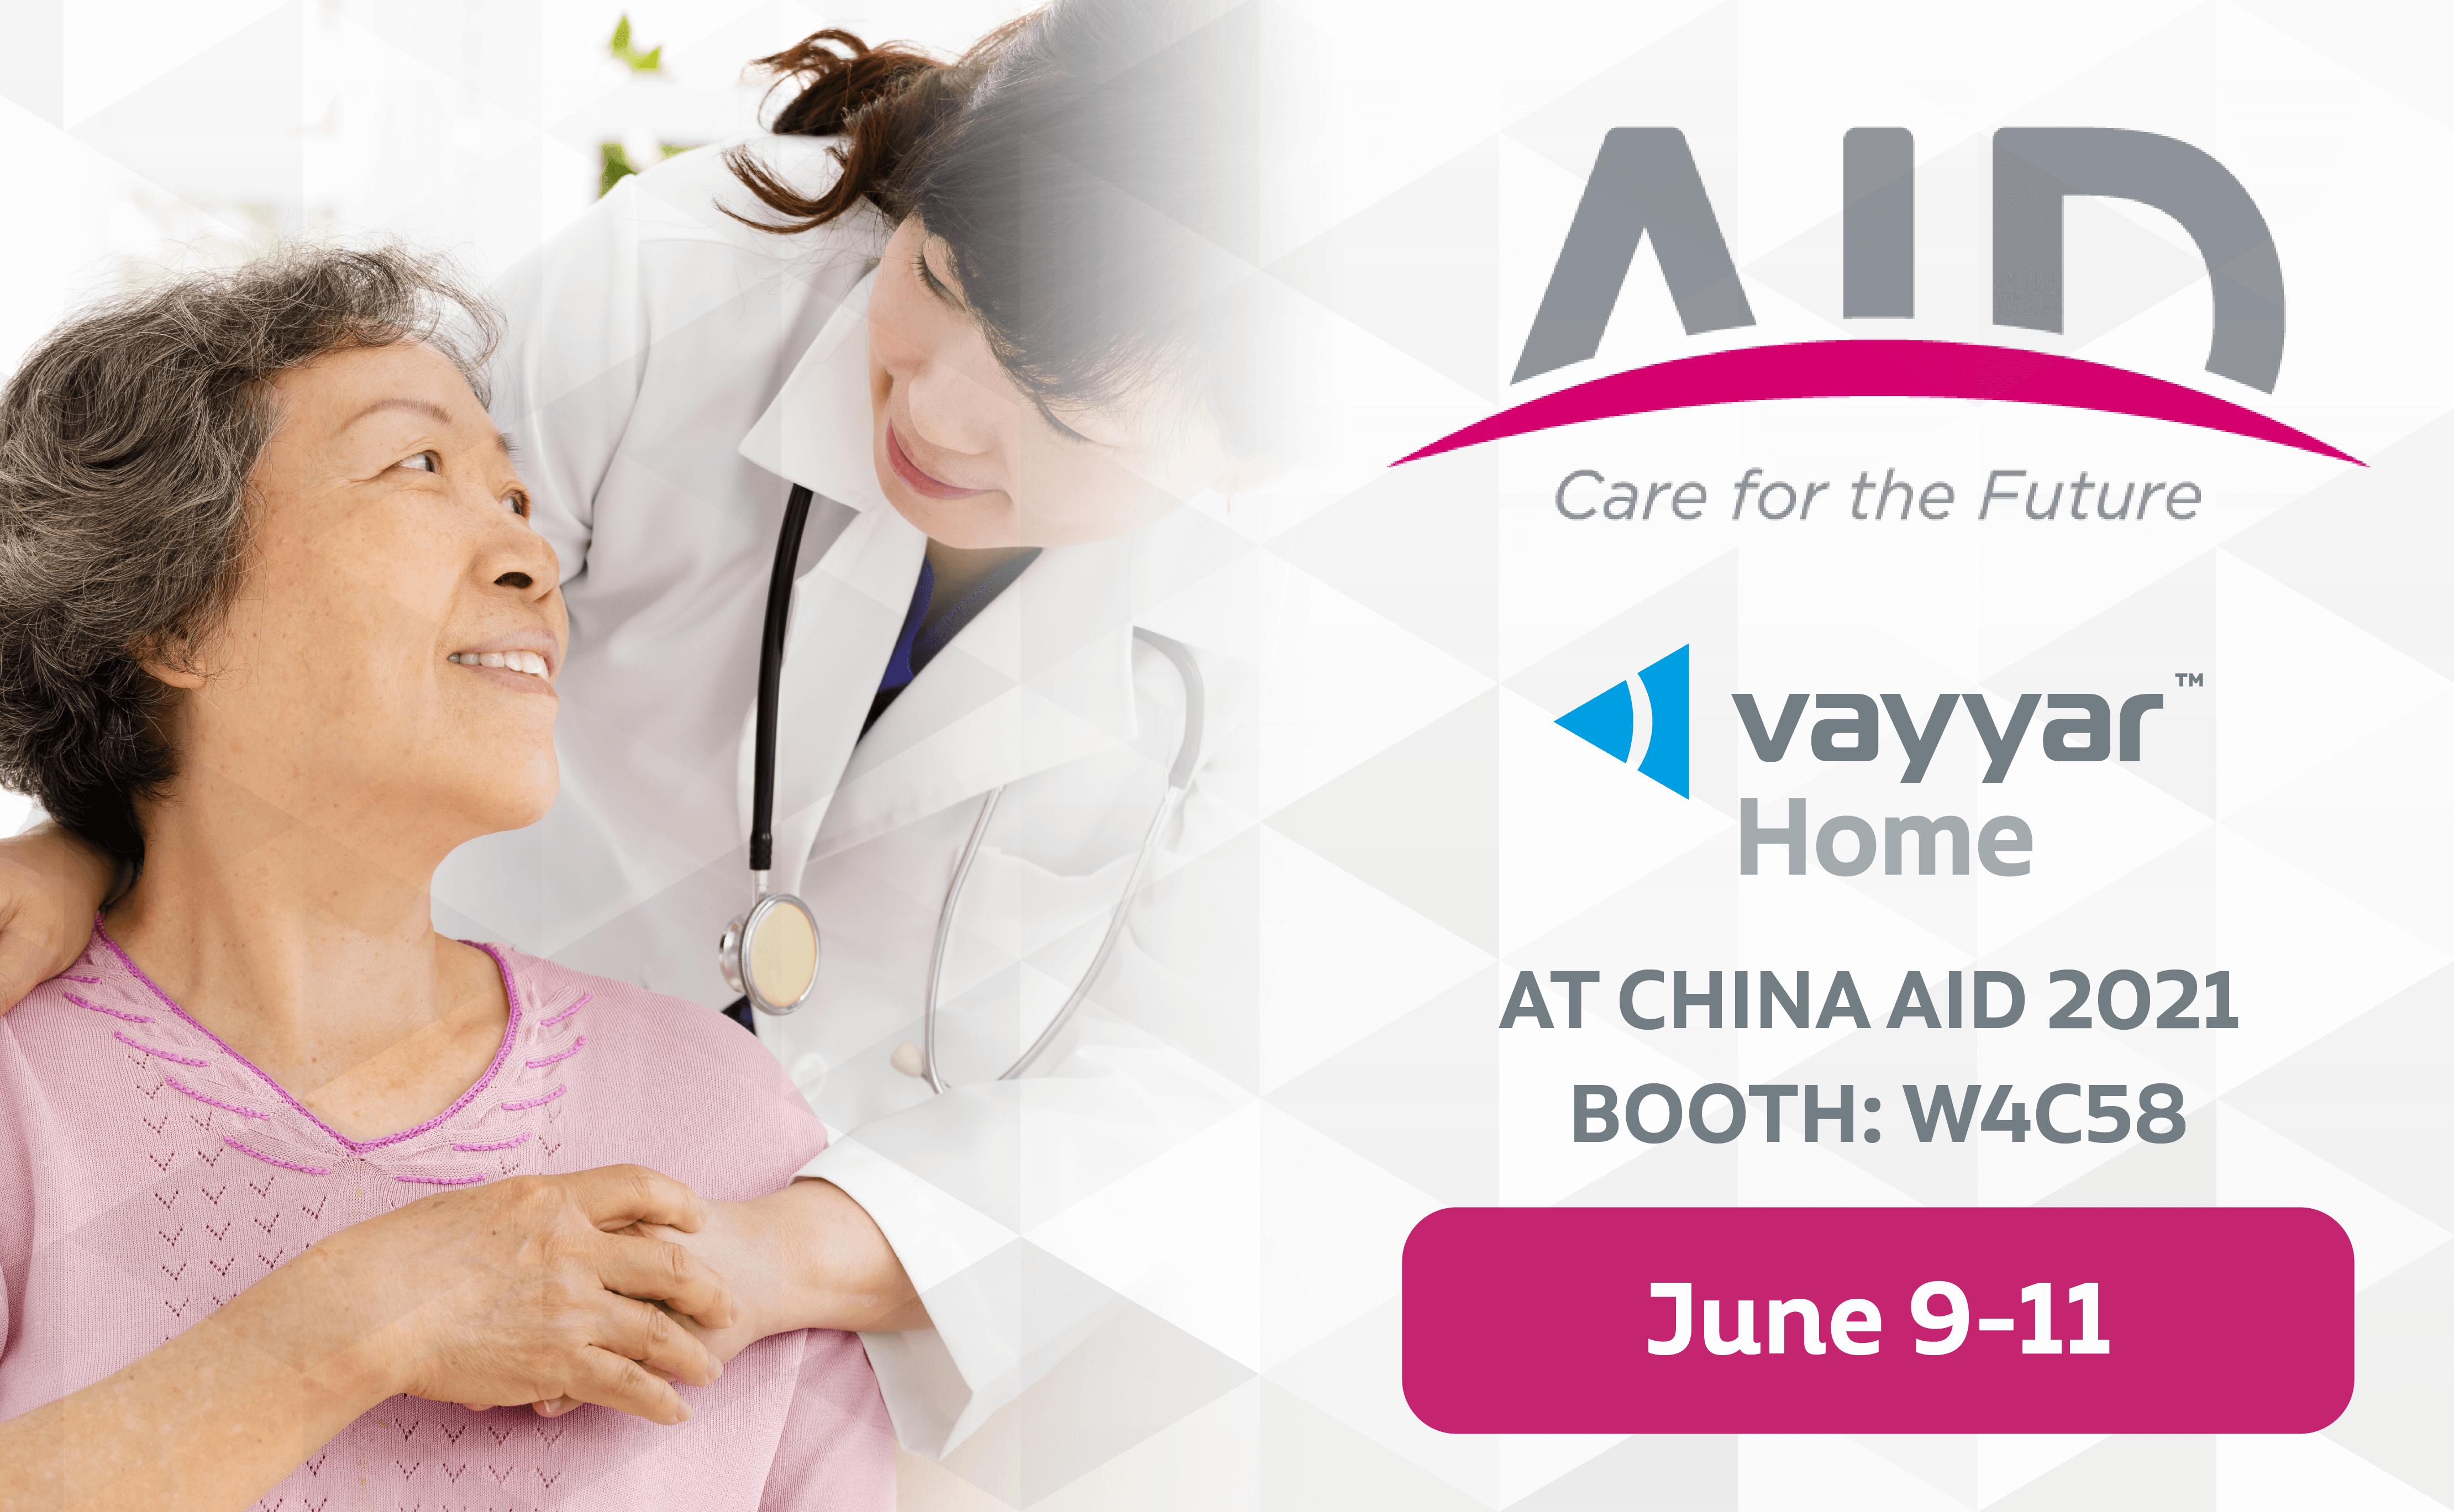 Vayyar Home at China AID 2021, Booth: W4C58 June 9-11